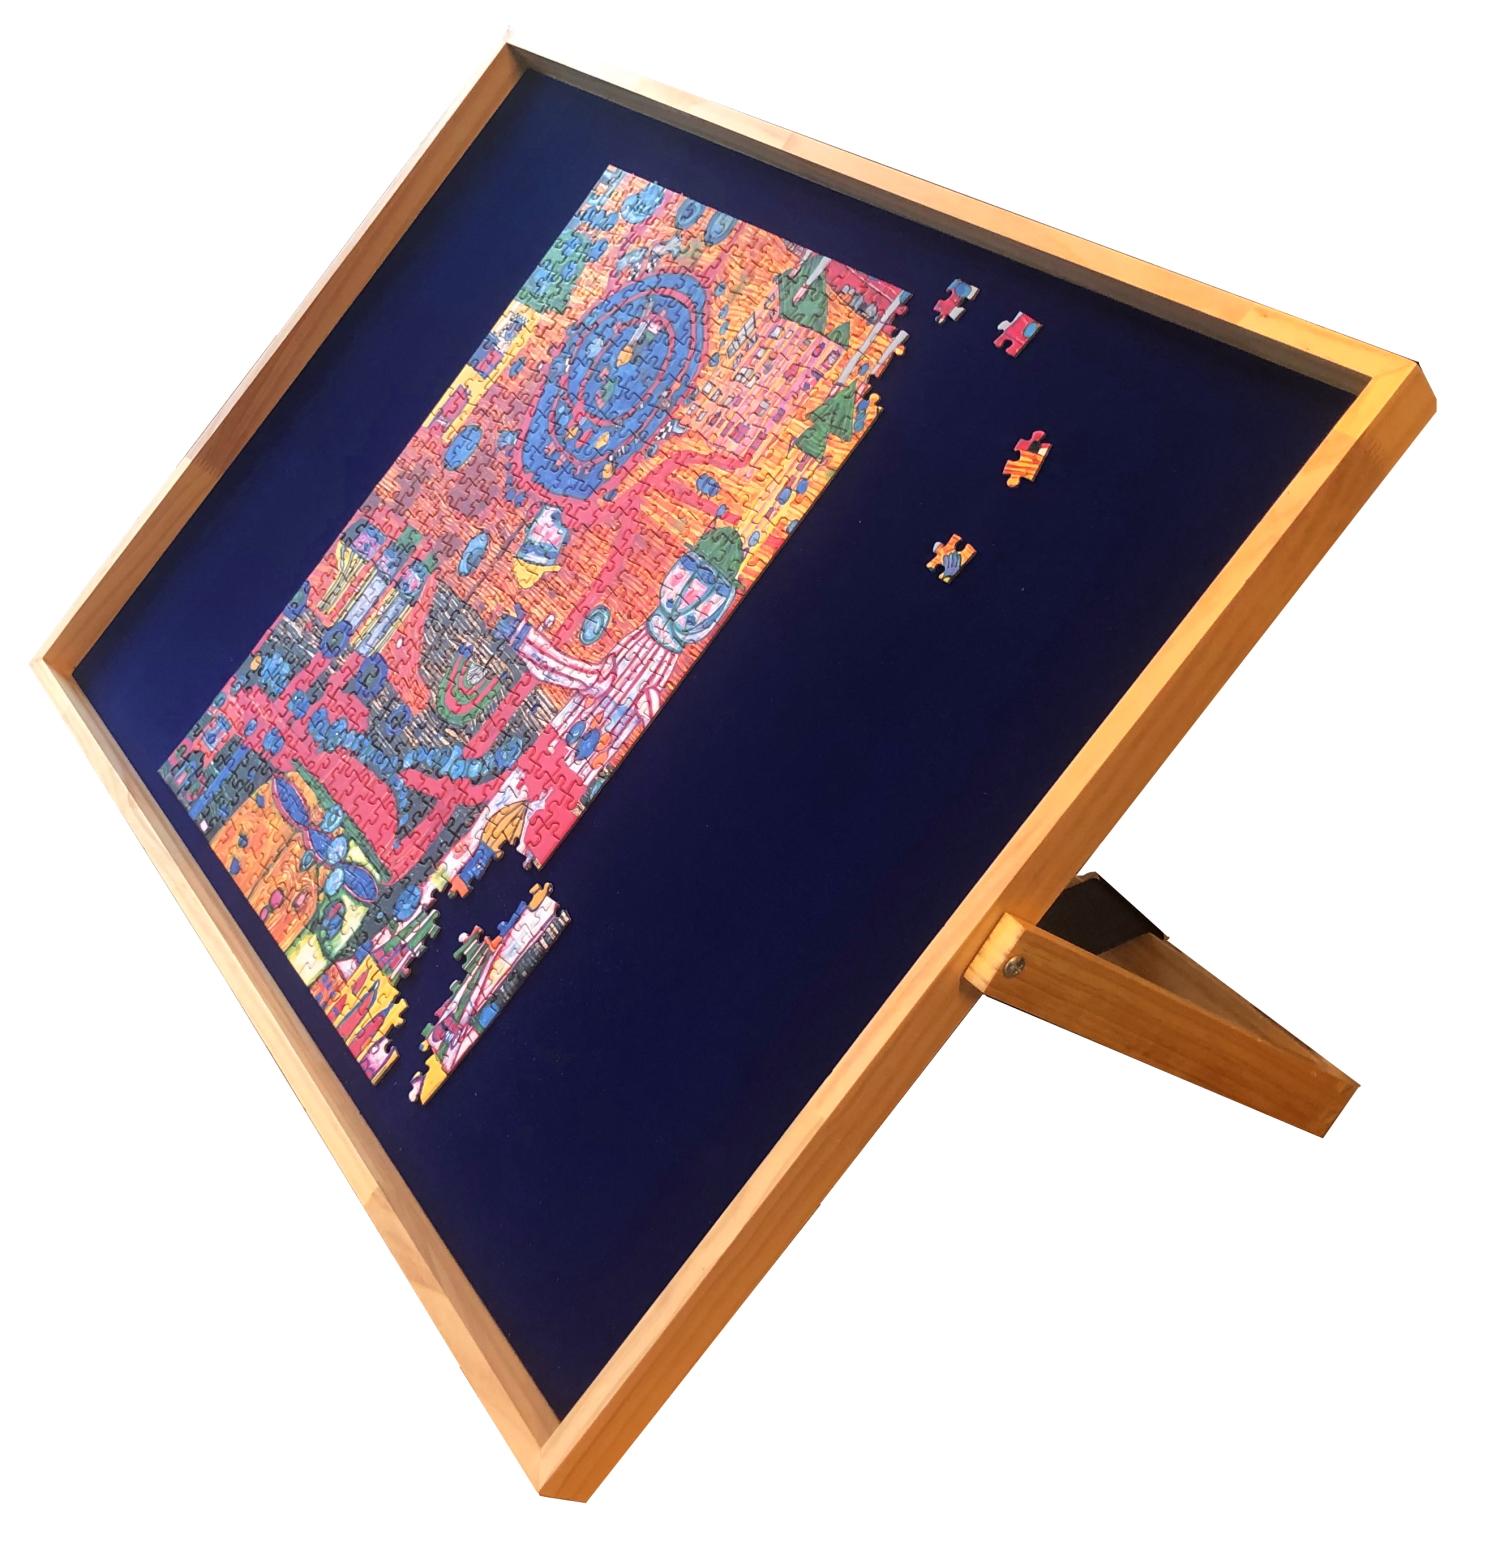 http://data.my-puzzle.fr/jig-and-puz.185/jig-puz-luxe-puzzle-table-100-a-1000-pieces-3-plateaux-de-tri.83070-1.fs.jpg